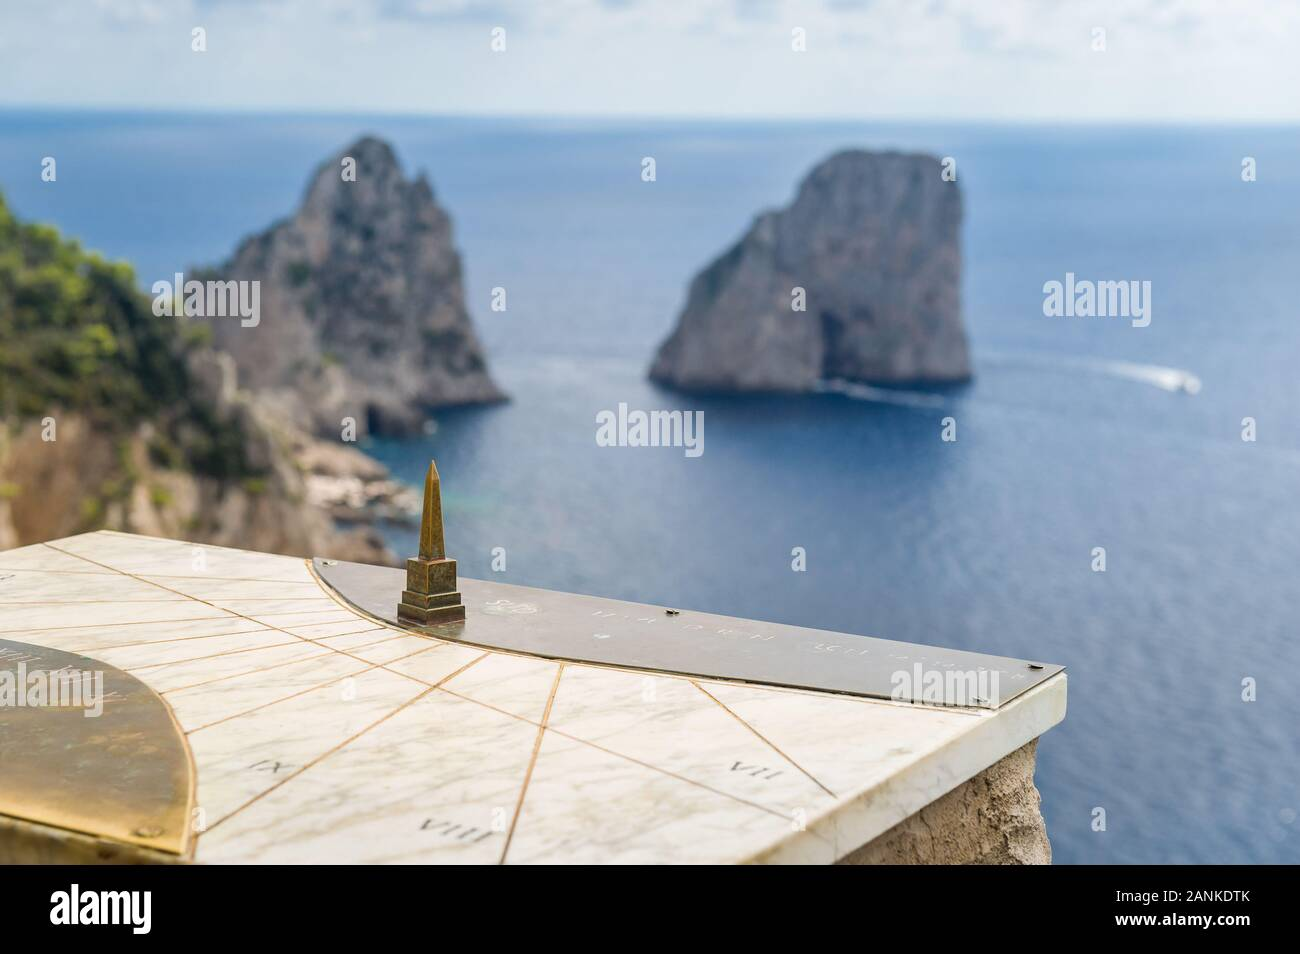 Cartina Costiera Amalfitana E Capri.Map Capri Immagini E Fotos Stock Alamy